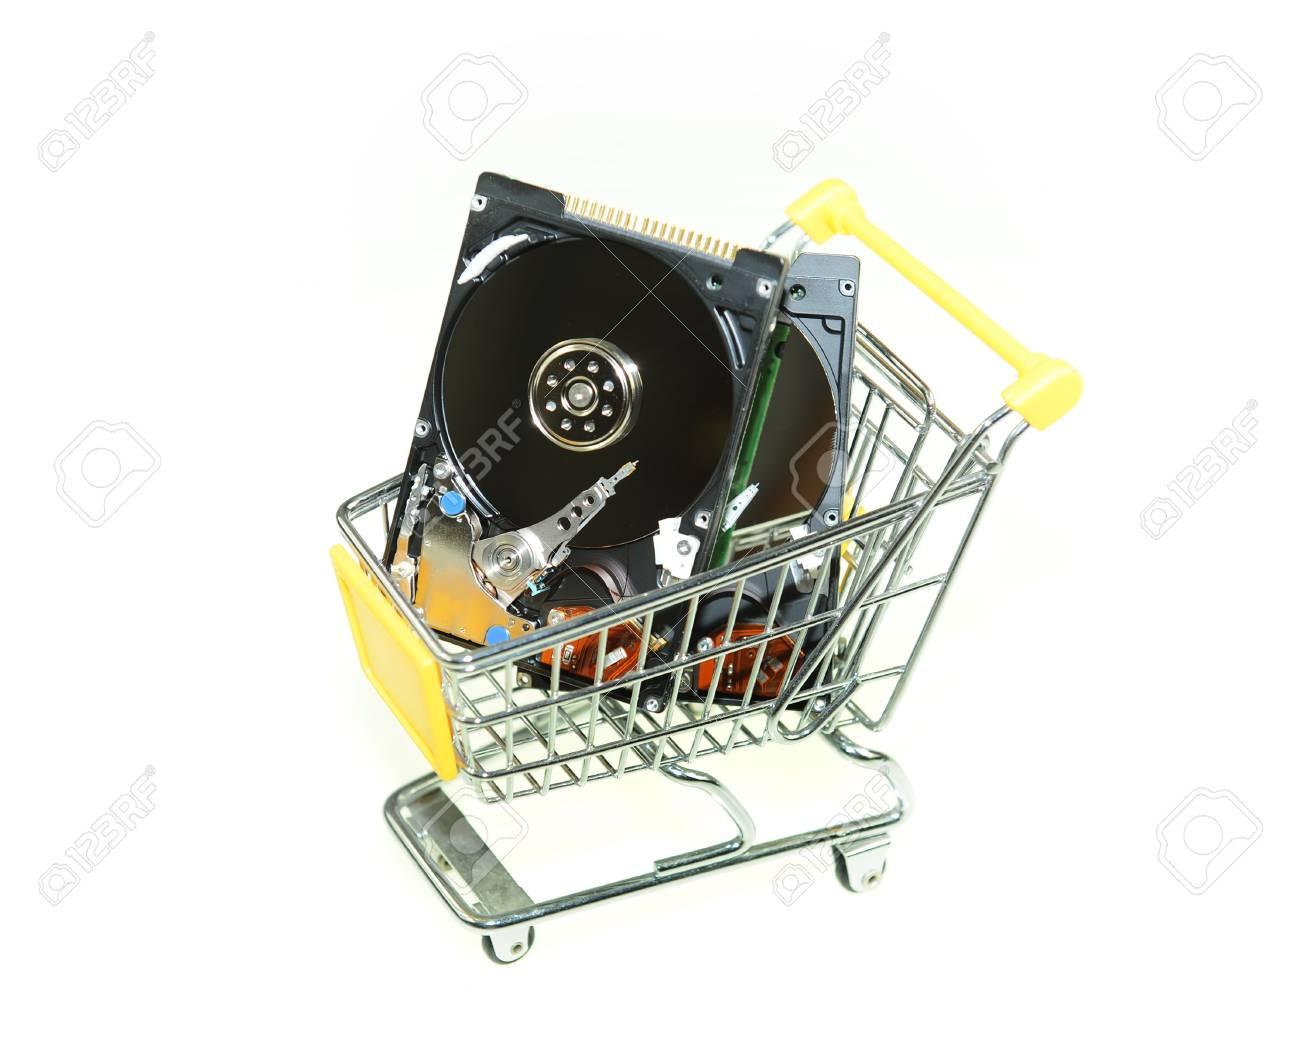 Computer hard disk in ship cart Stock Photo - 10867682